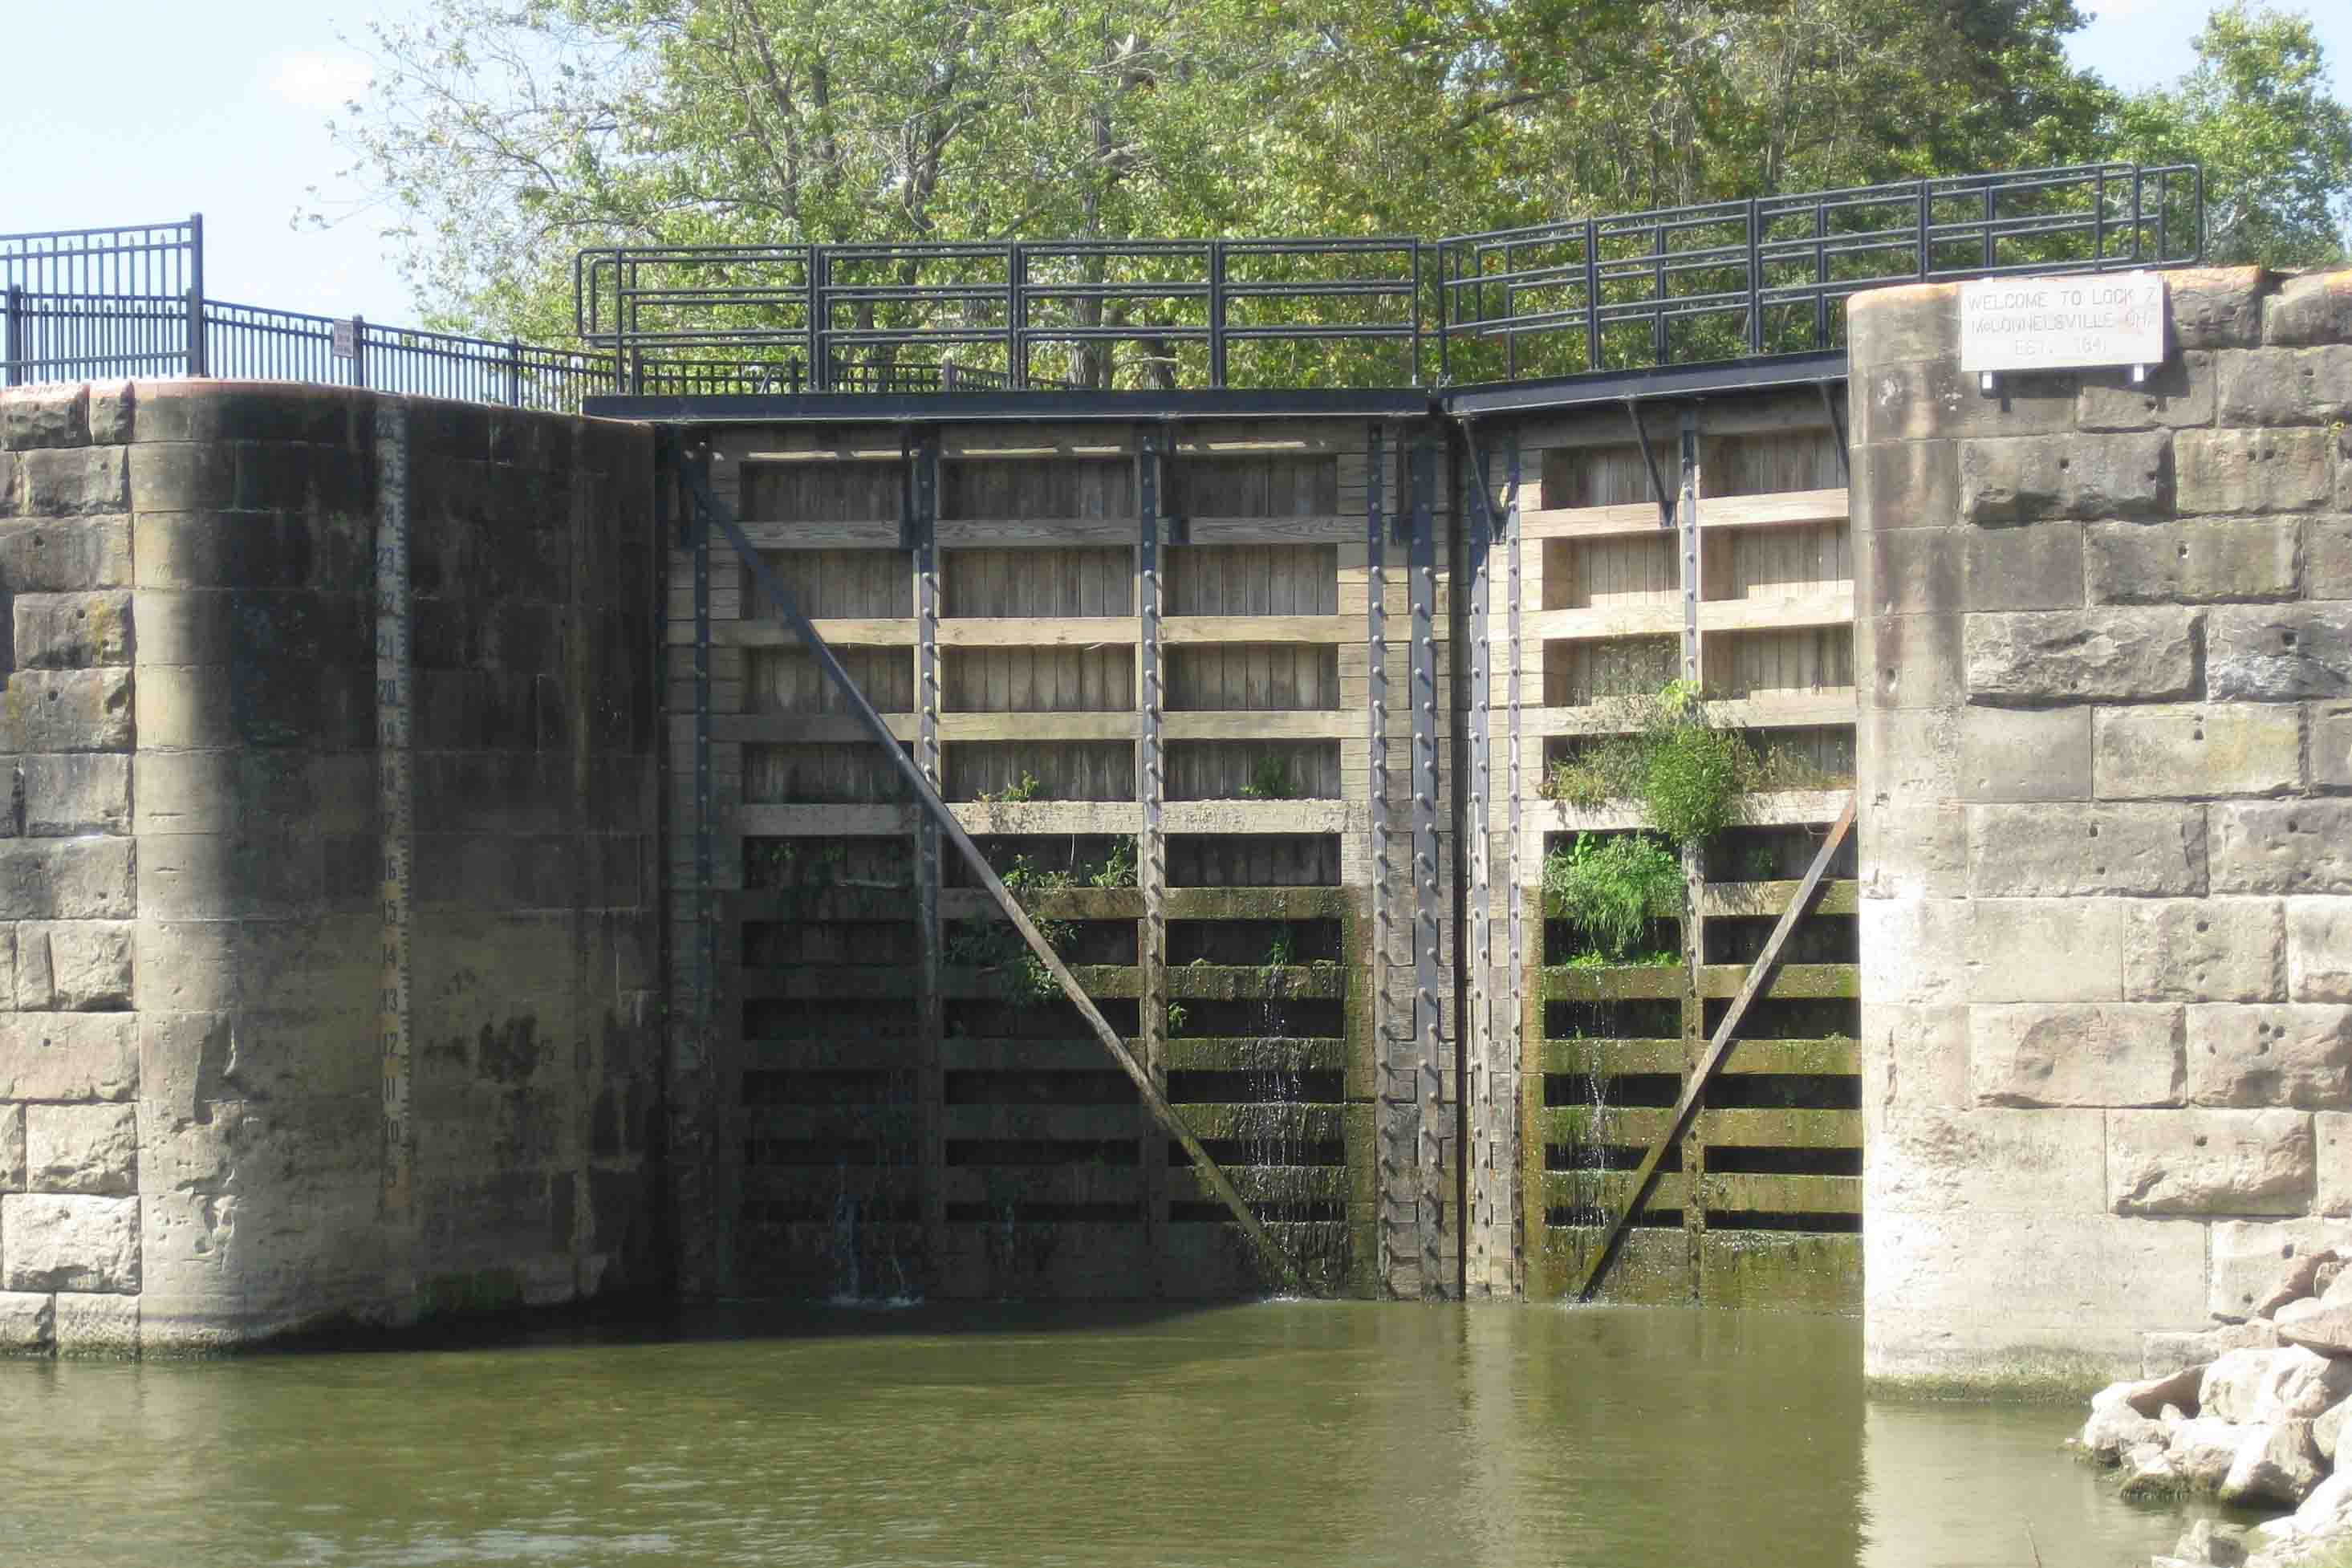 McConnelsville lock in southeastern ohio